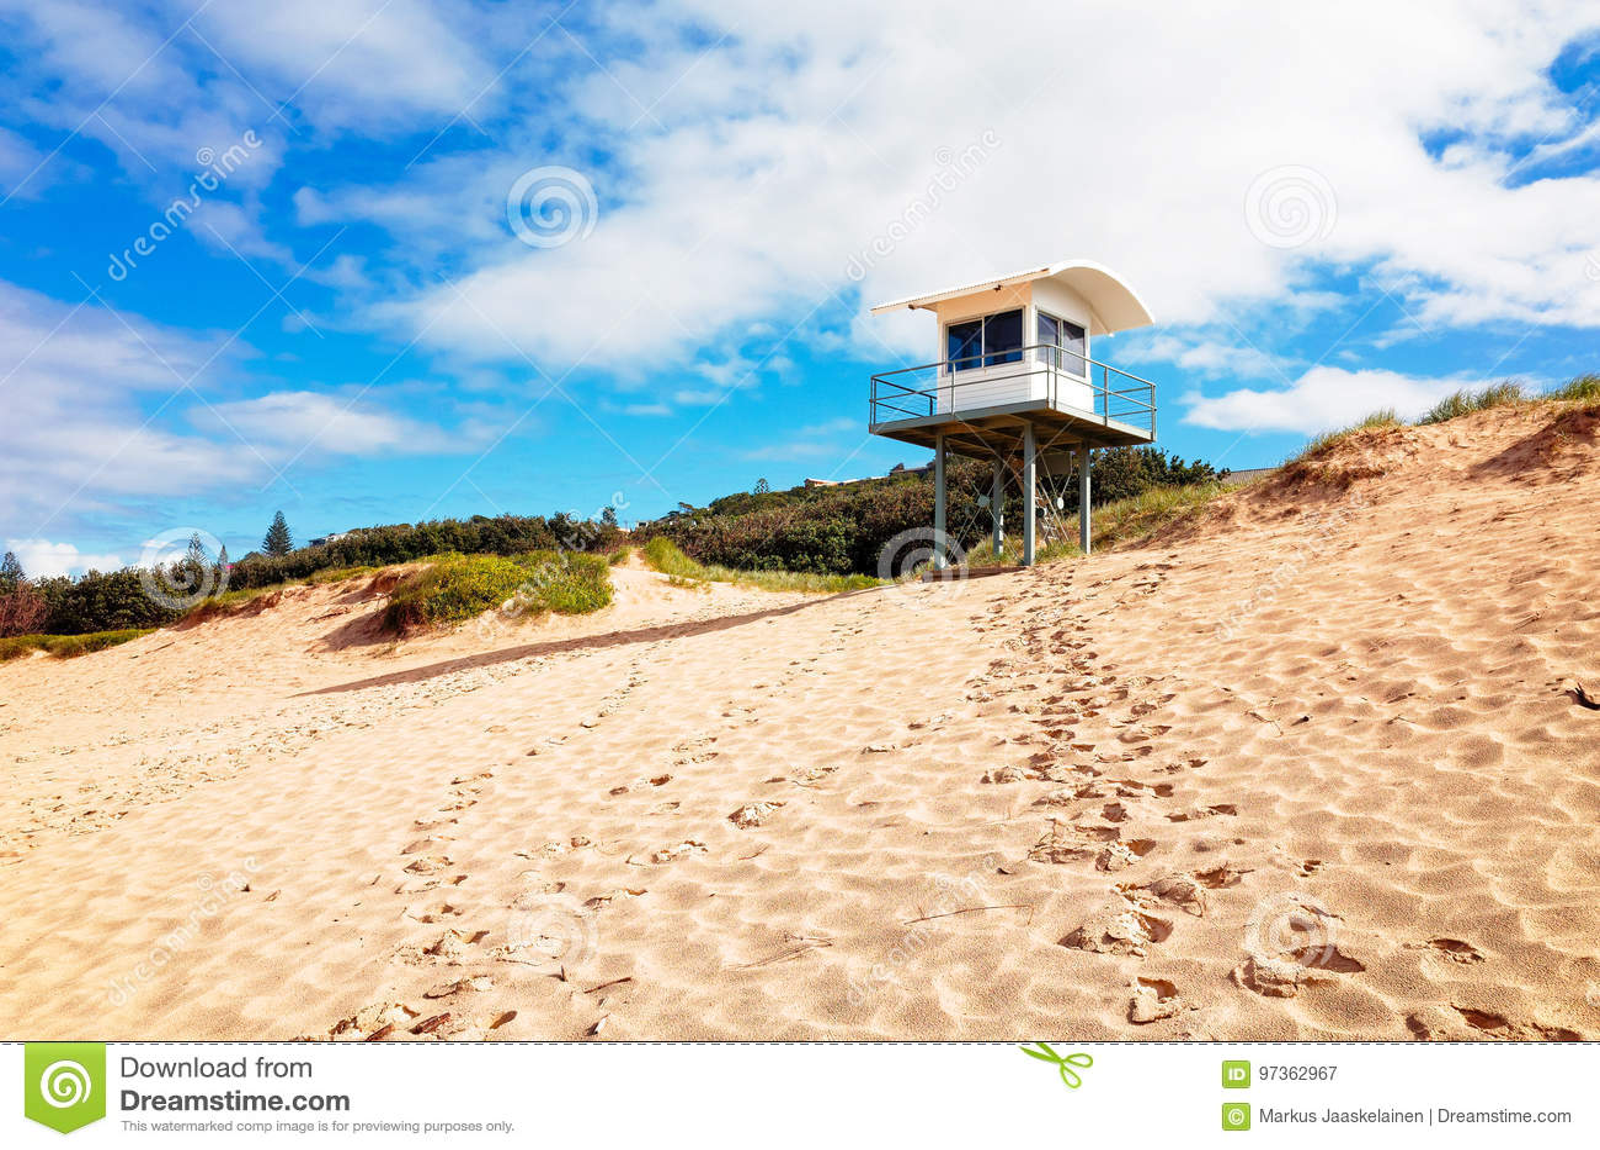 bc8590fc92d Lifeguard tower on Lighthouse Beach in Portmacquarie Australia. Lifeguard  hut overlooking sandy beach. Australian beach surveillance tower.